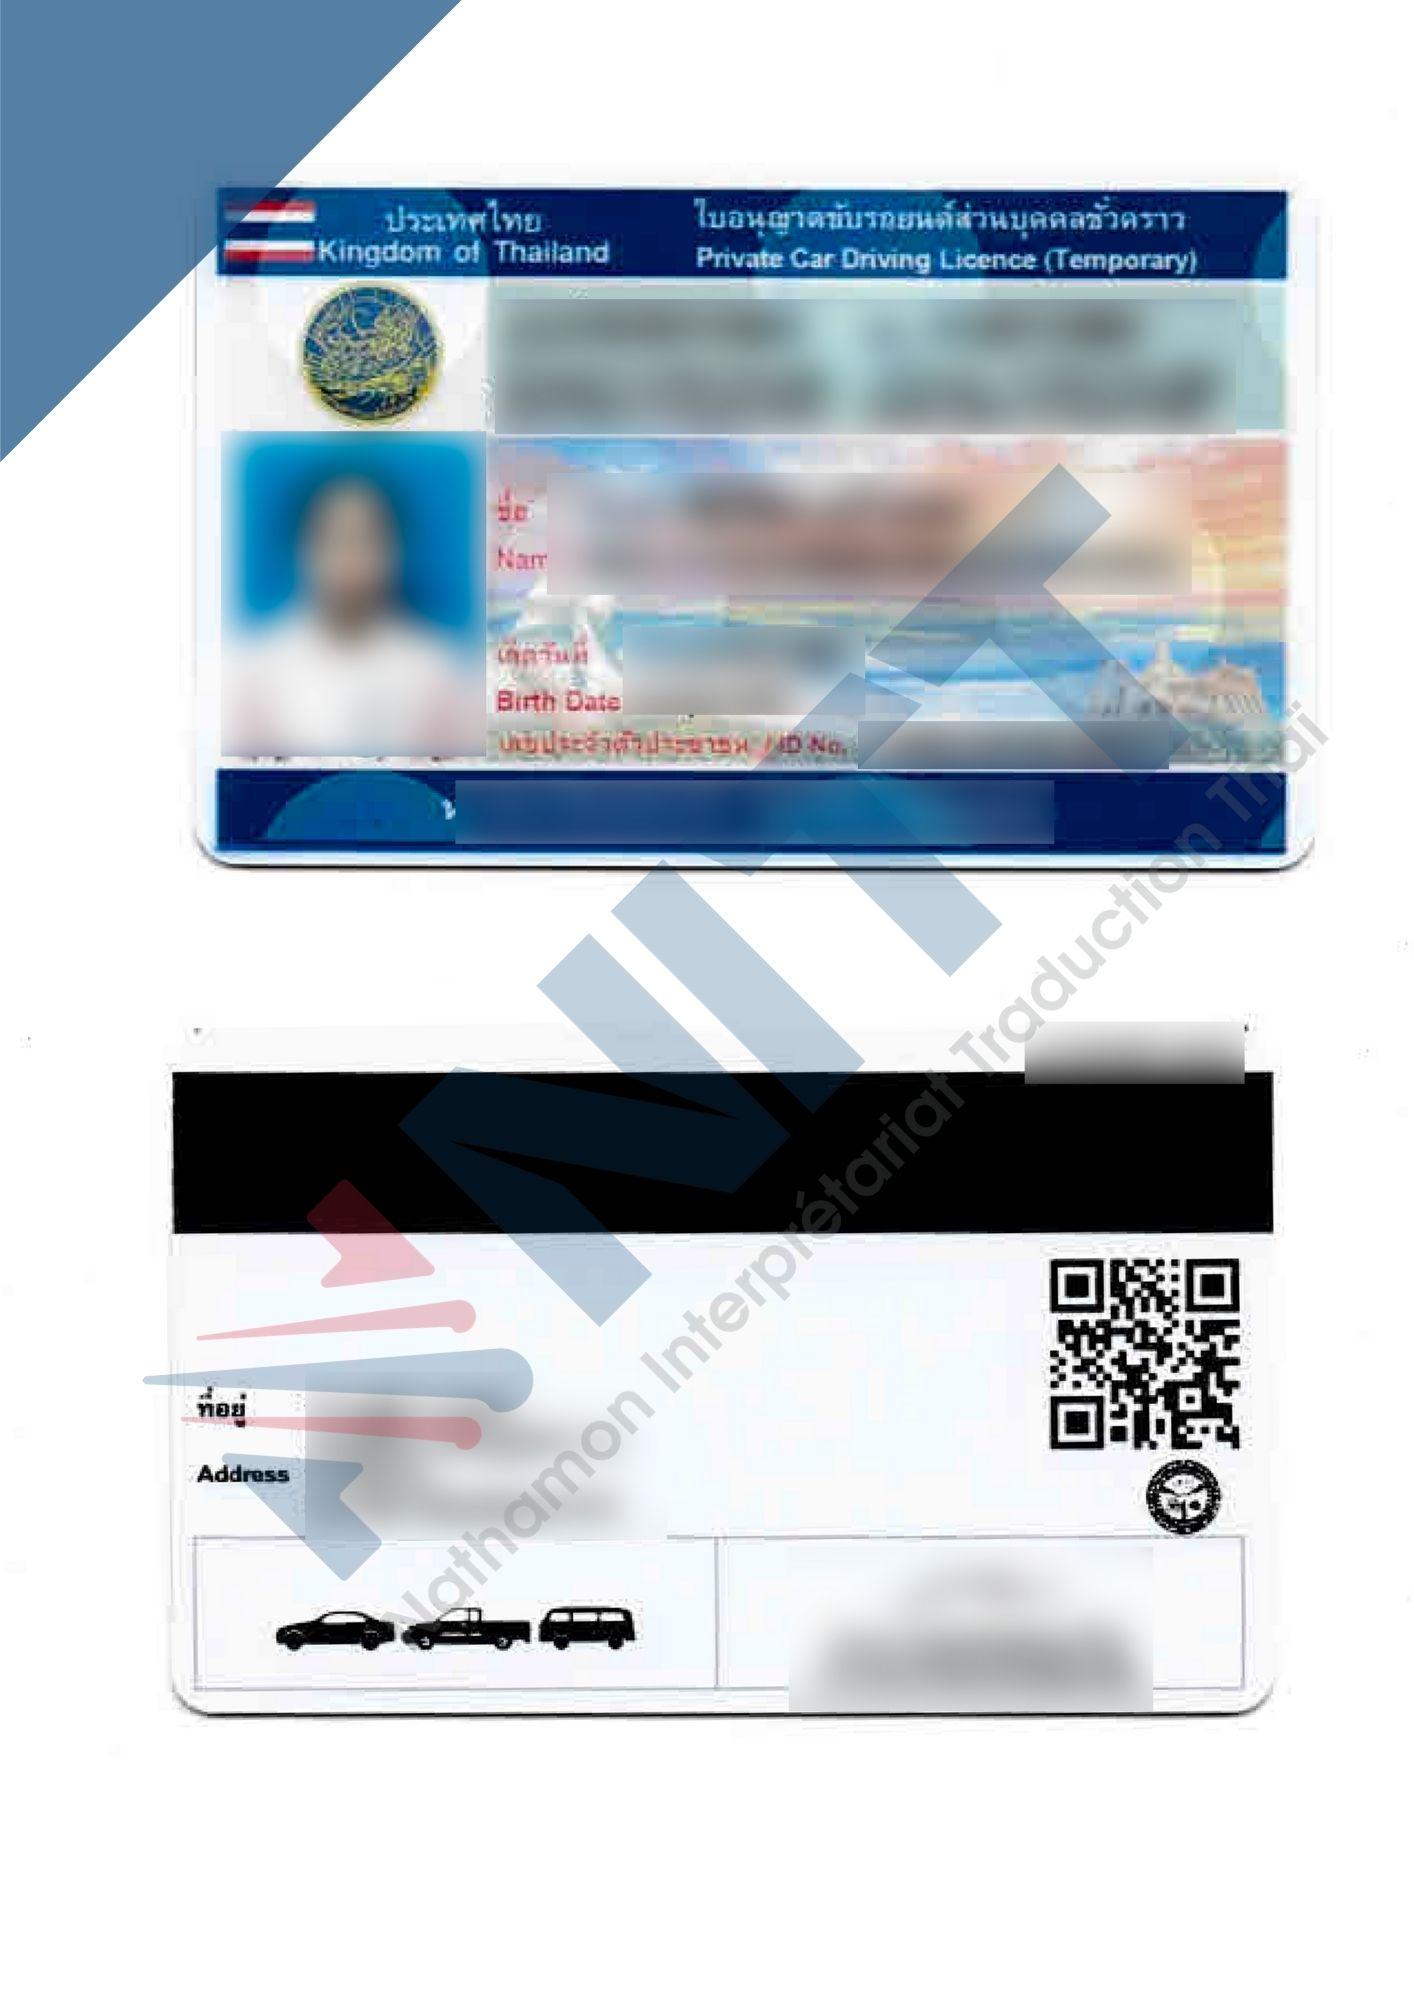 Permis de conduire thailandais